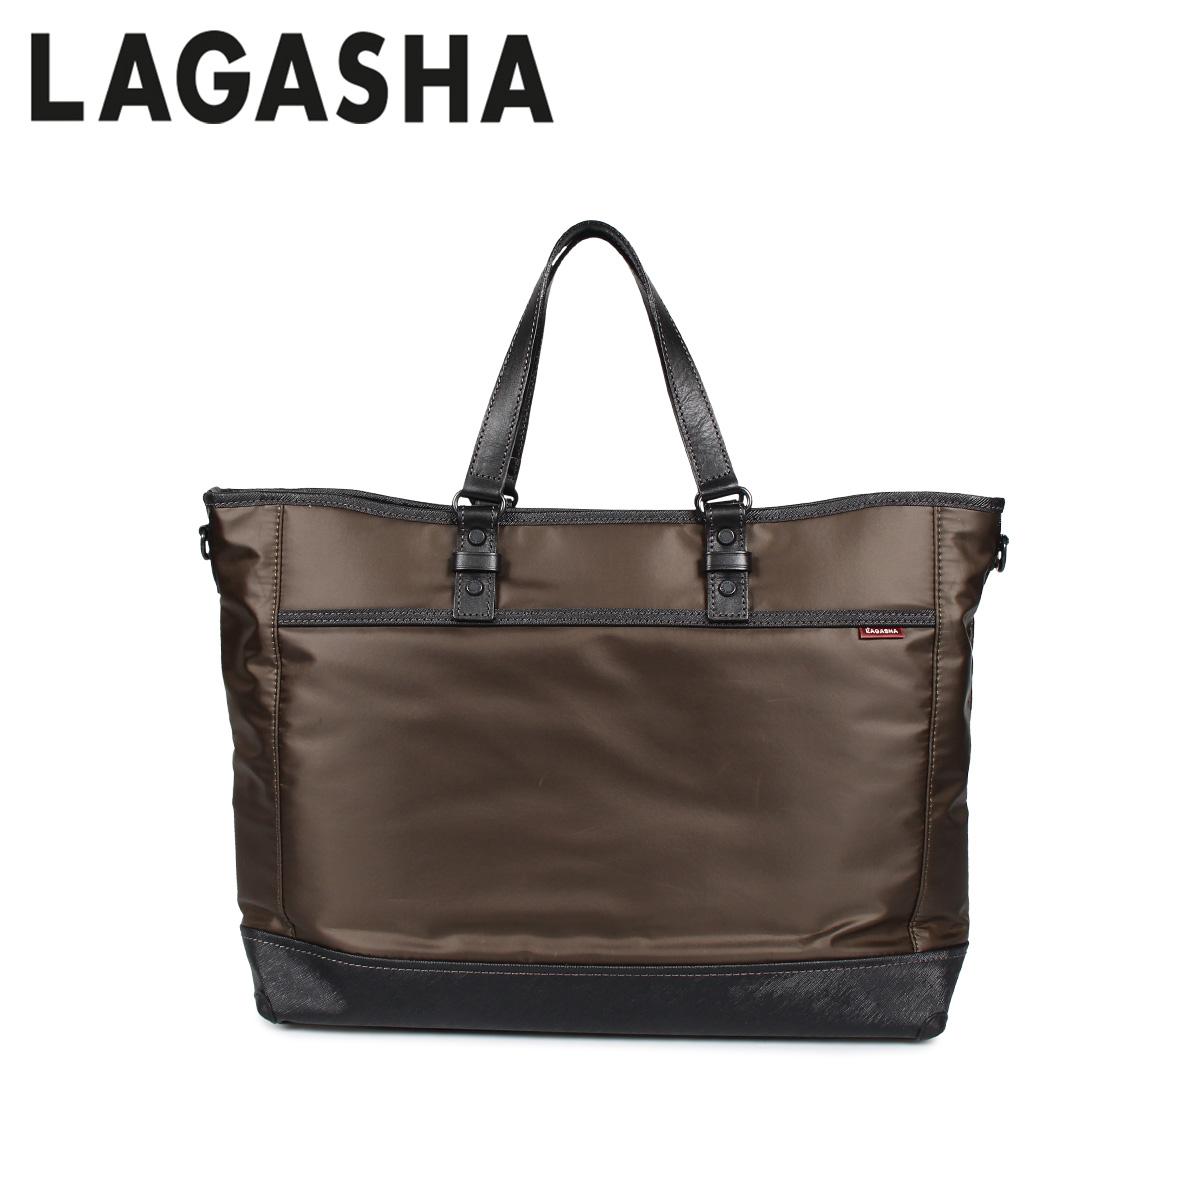 LAGASHA UPLIGHT ラガシャ アップライト バッグ ビジネスバッグ ブリーフケース メンズ ネイビー カーキ 7229